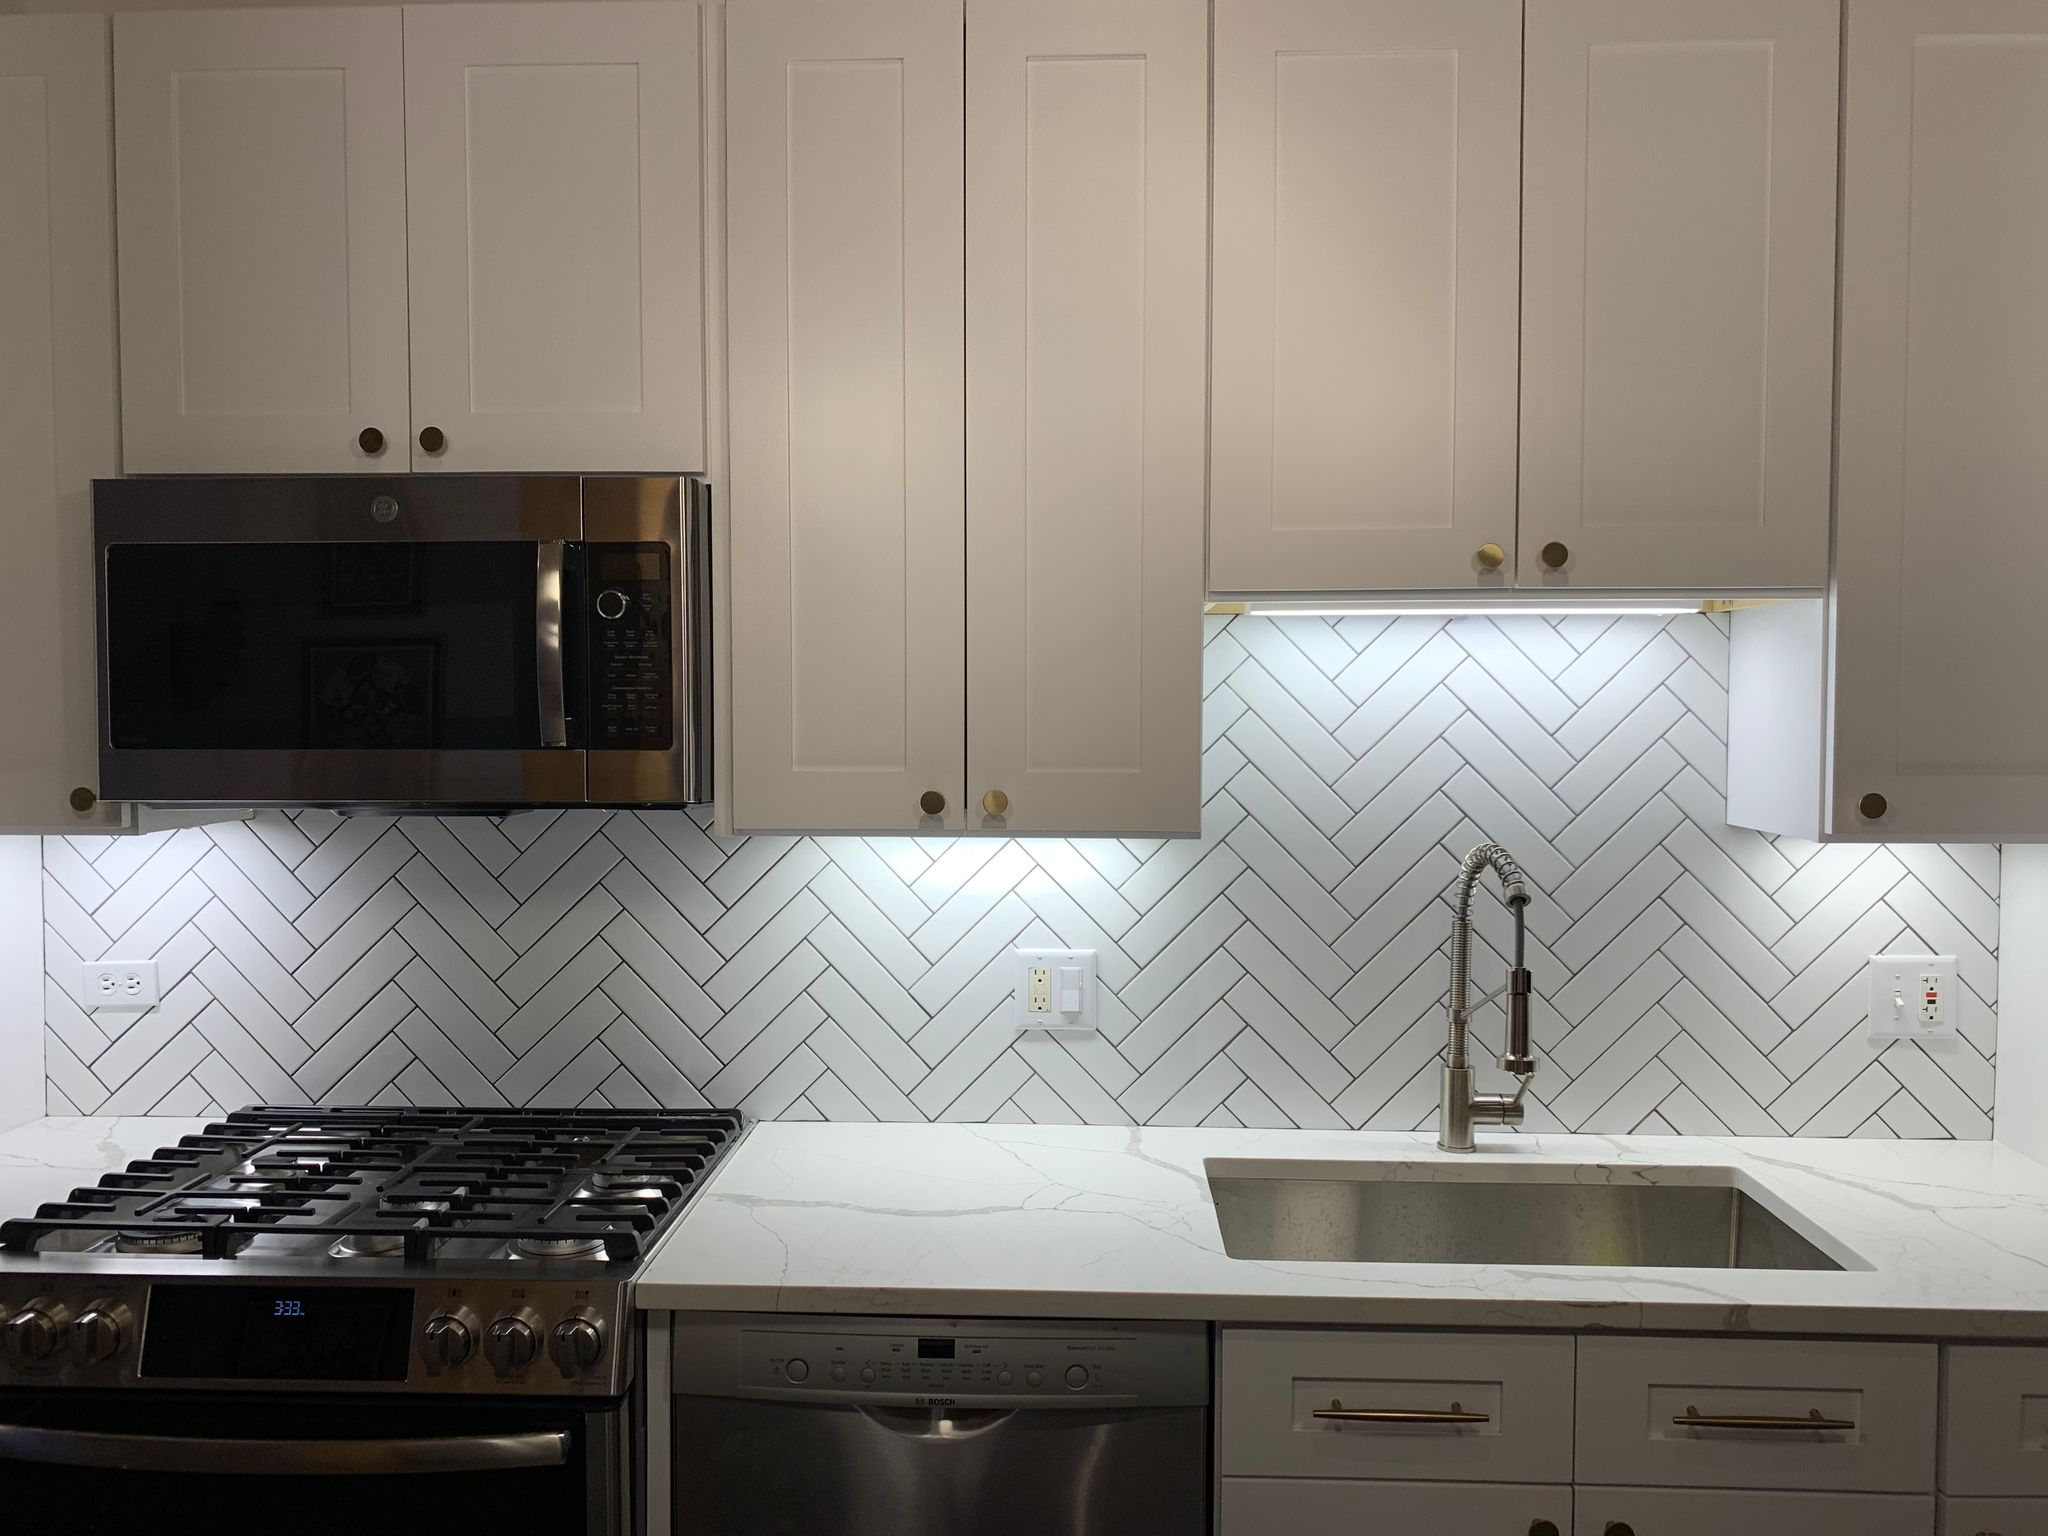 Tile & Backsplashes